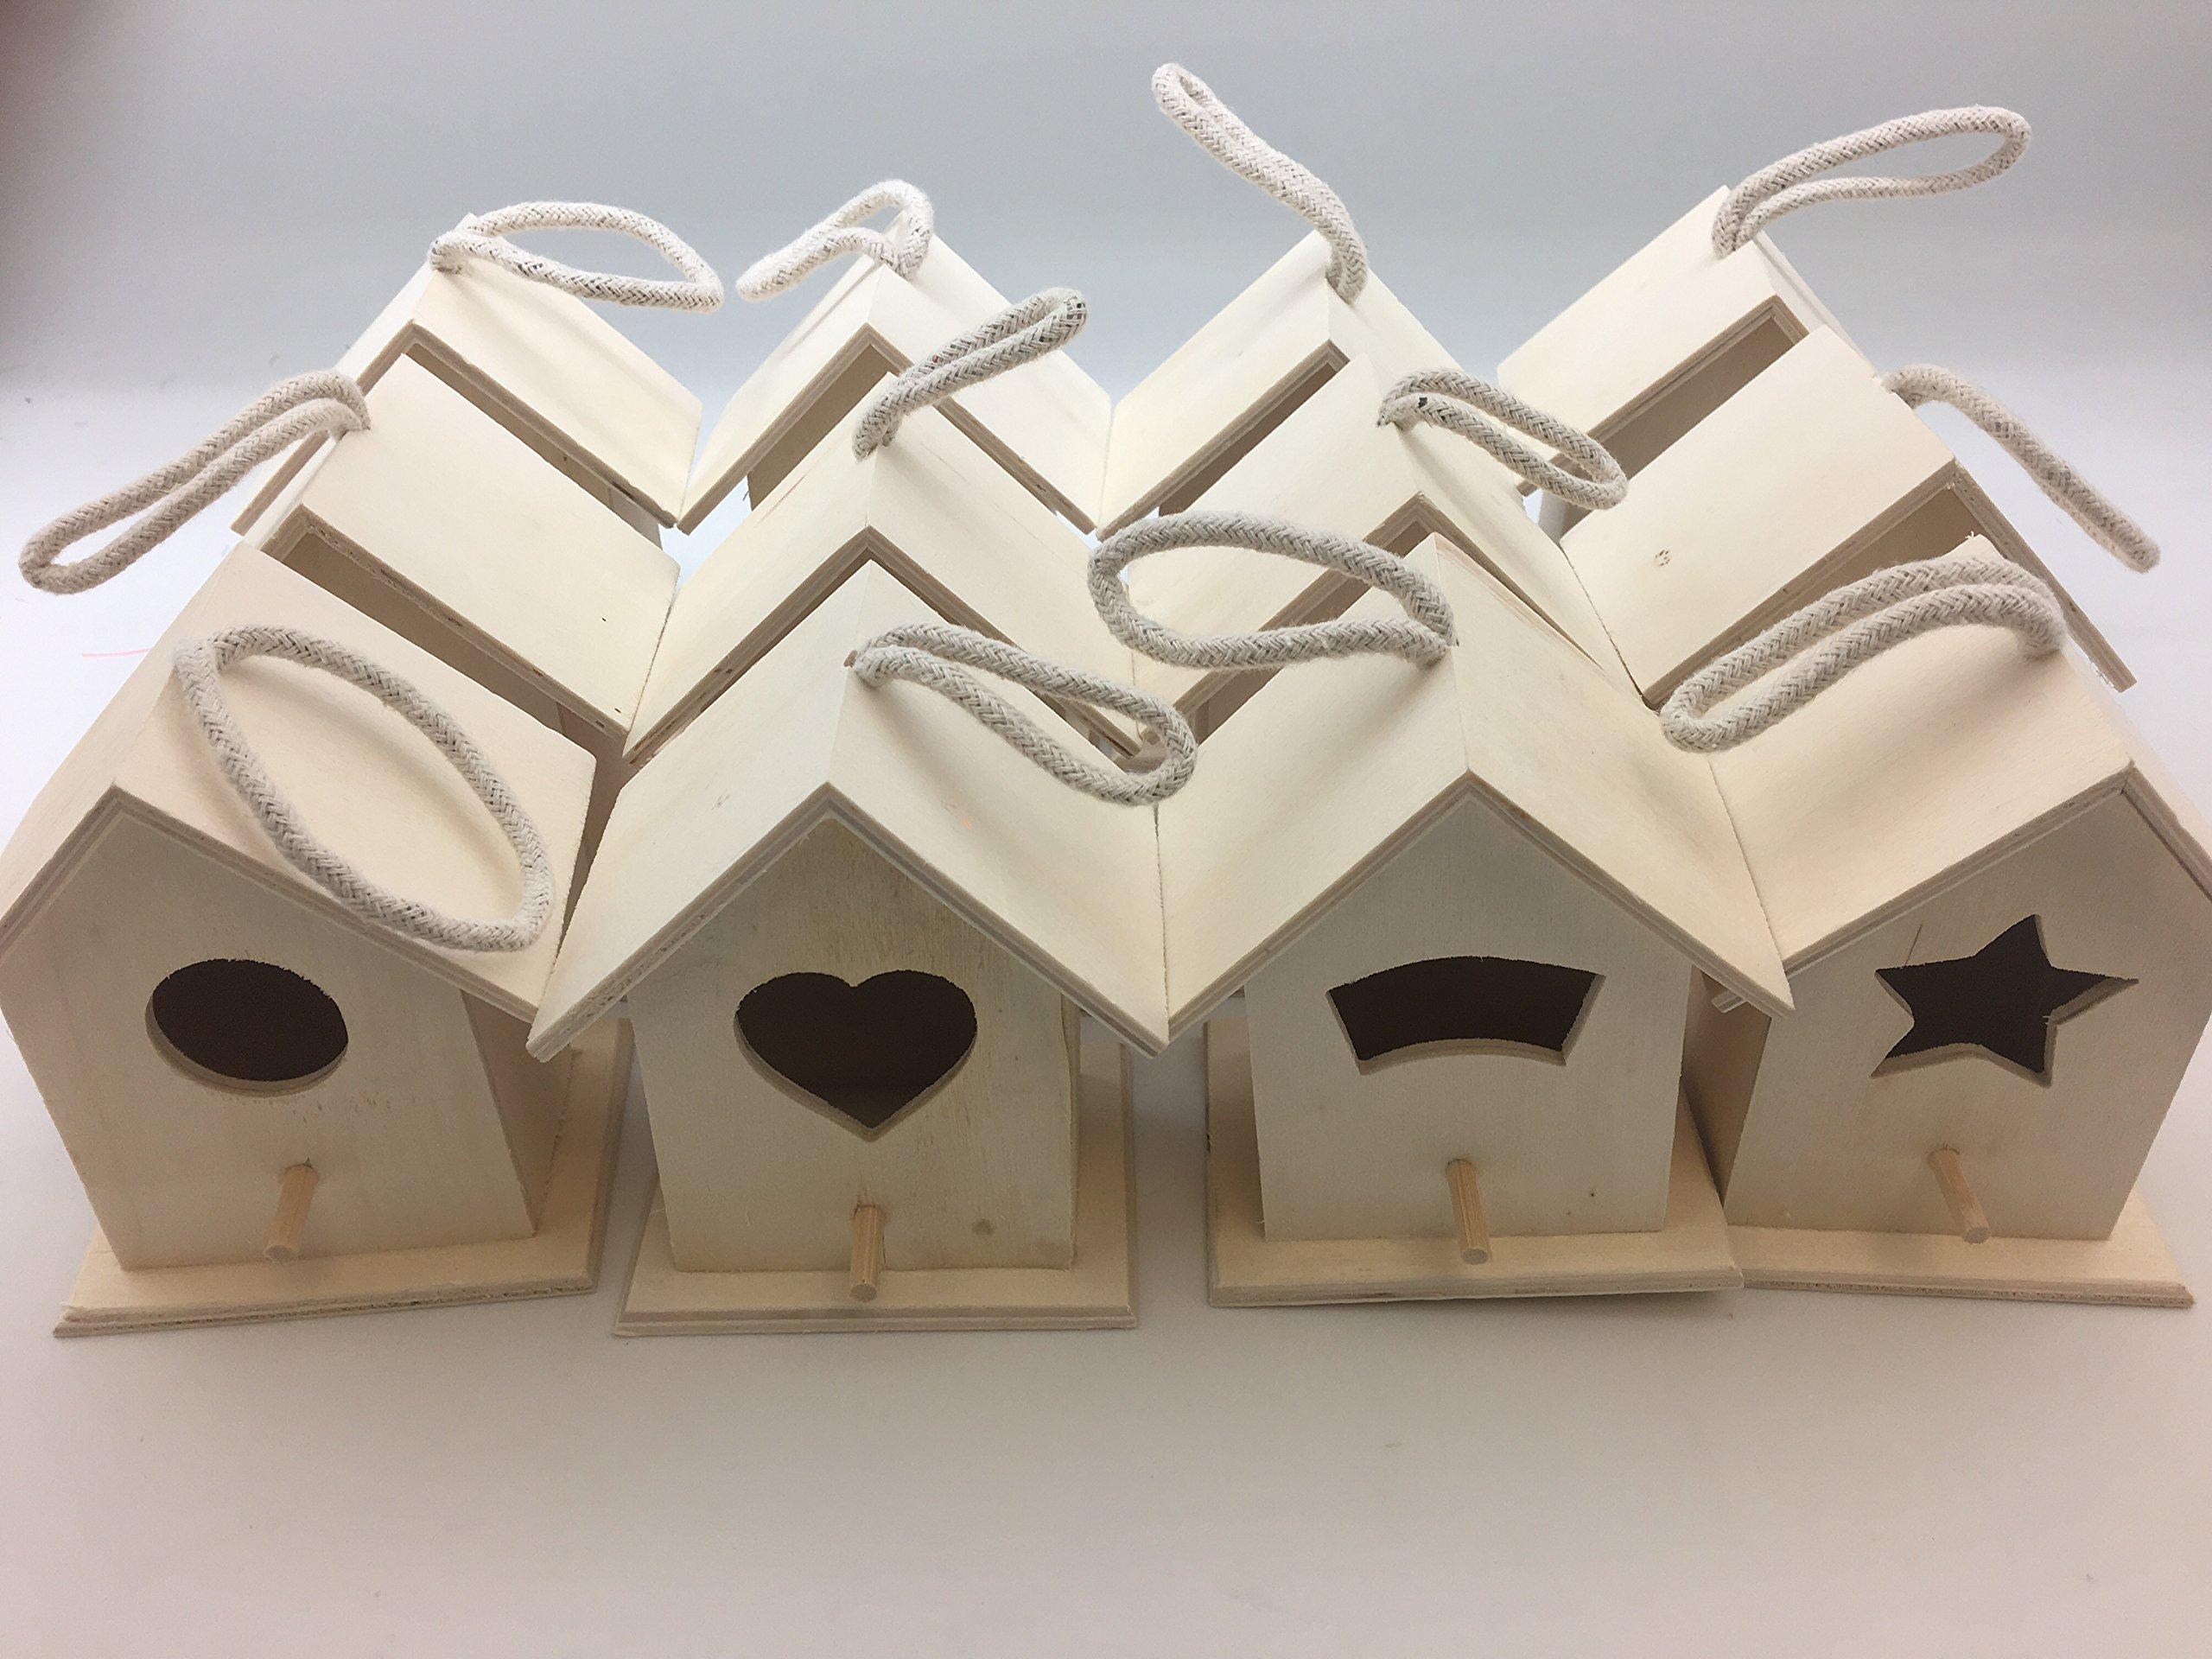 Oojami Design Your Own Wooden Birdhouses 12 Bird House Bulk